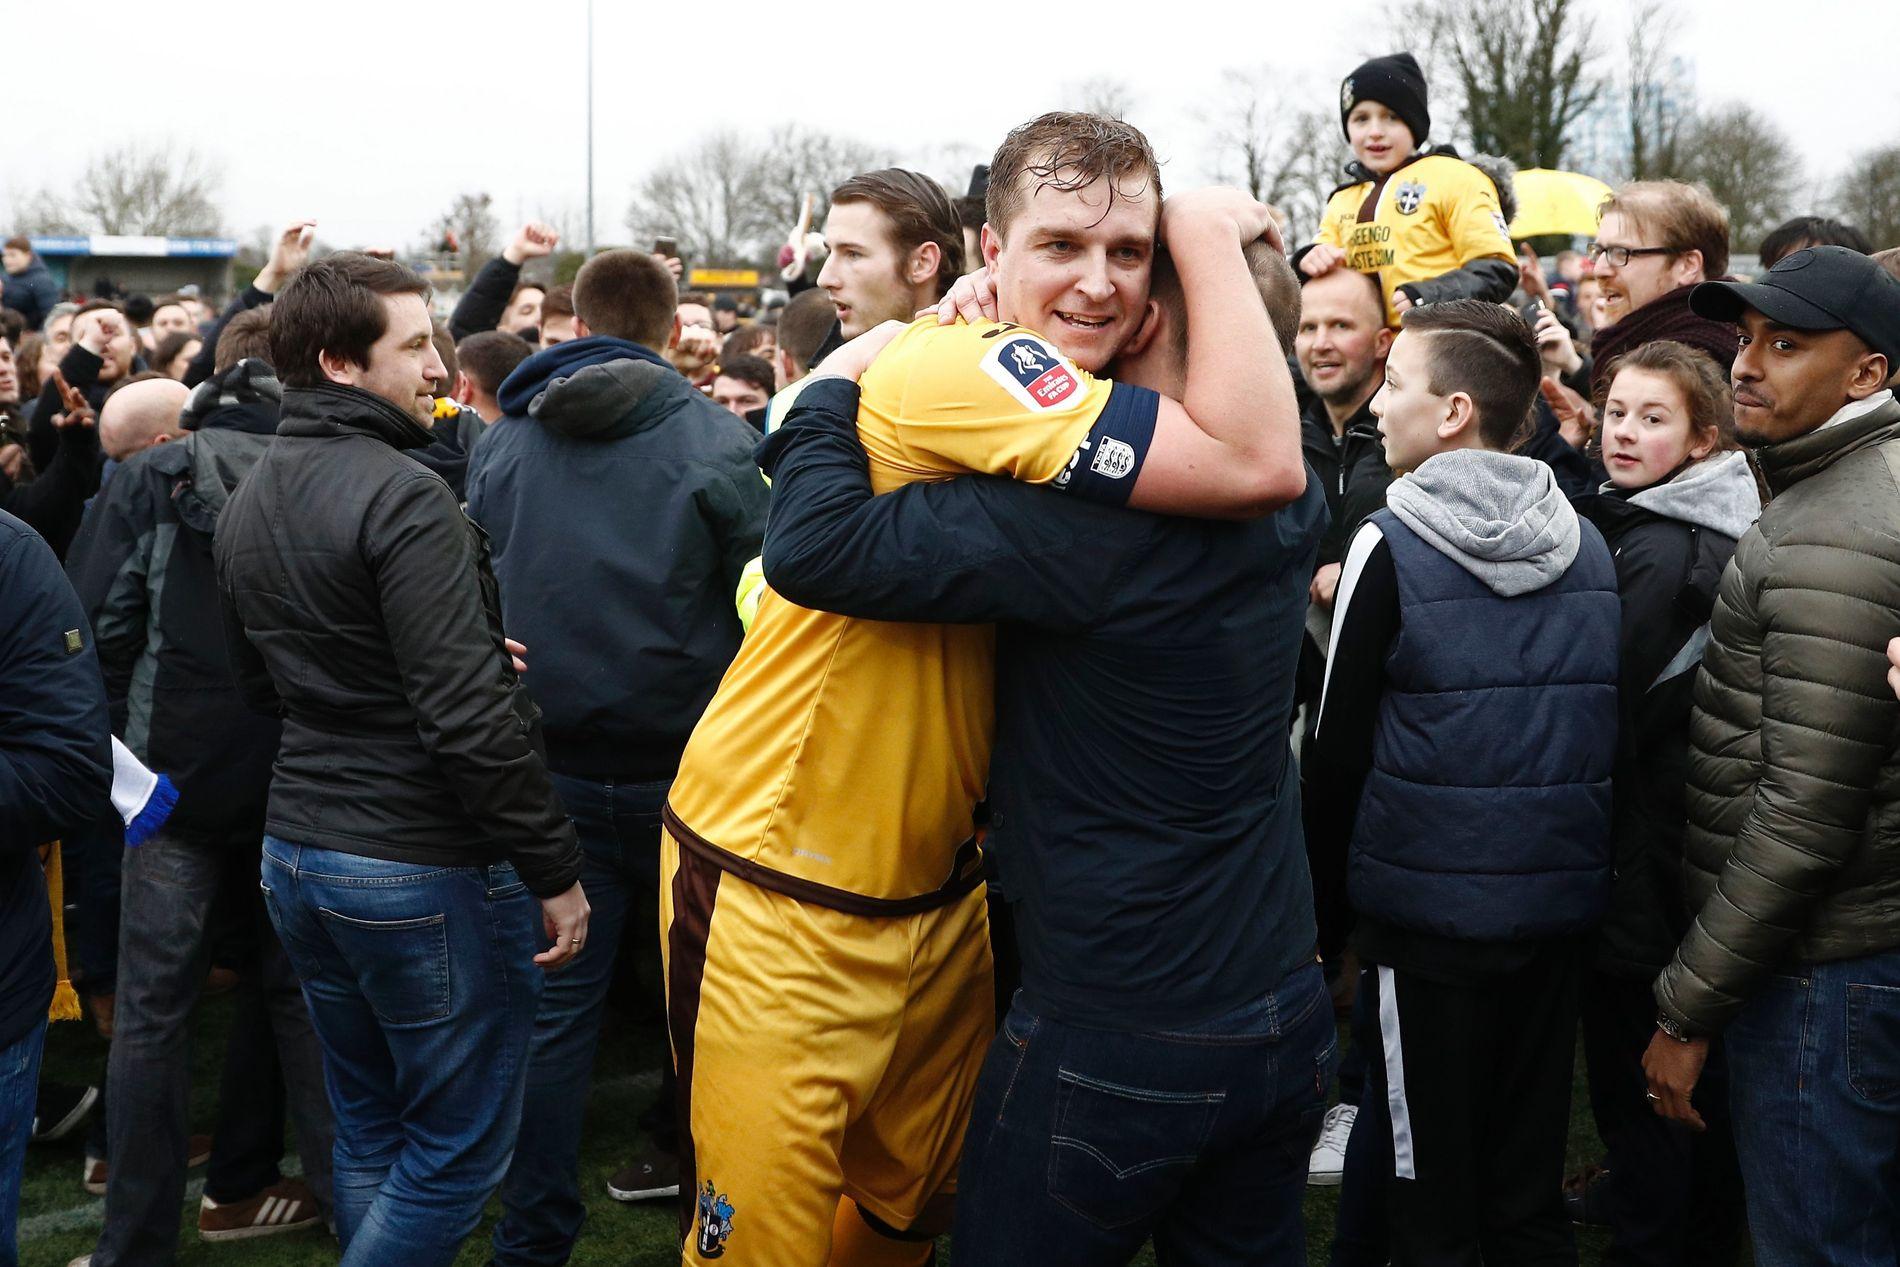 FEST: Supporterne stormet banen etter at målscorer Jamie Collins og Sutton slo Leeds søndag.